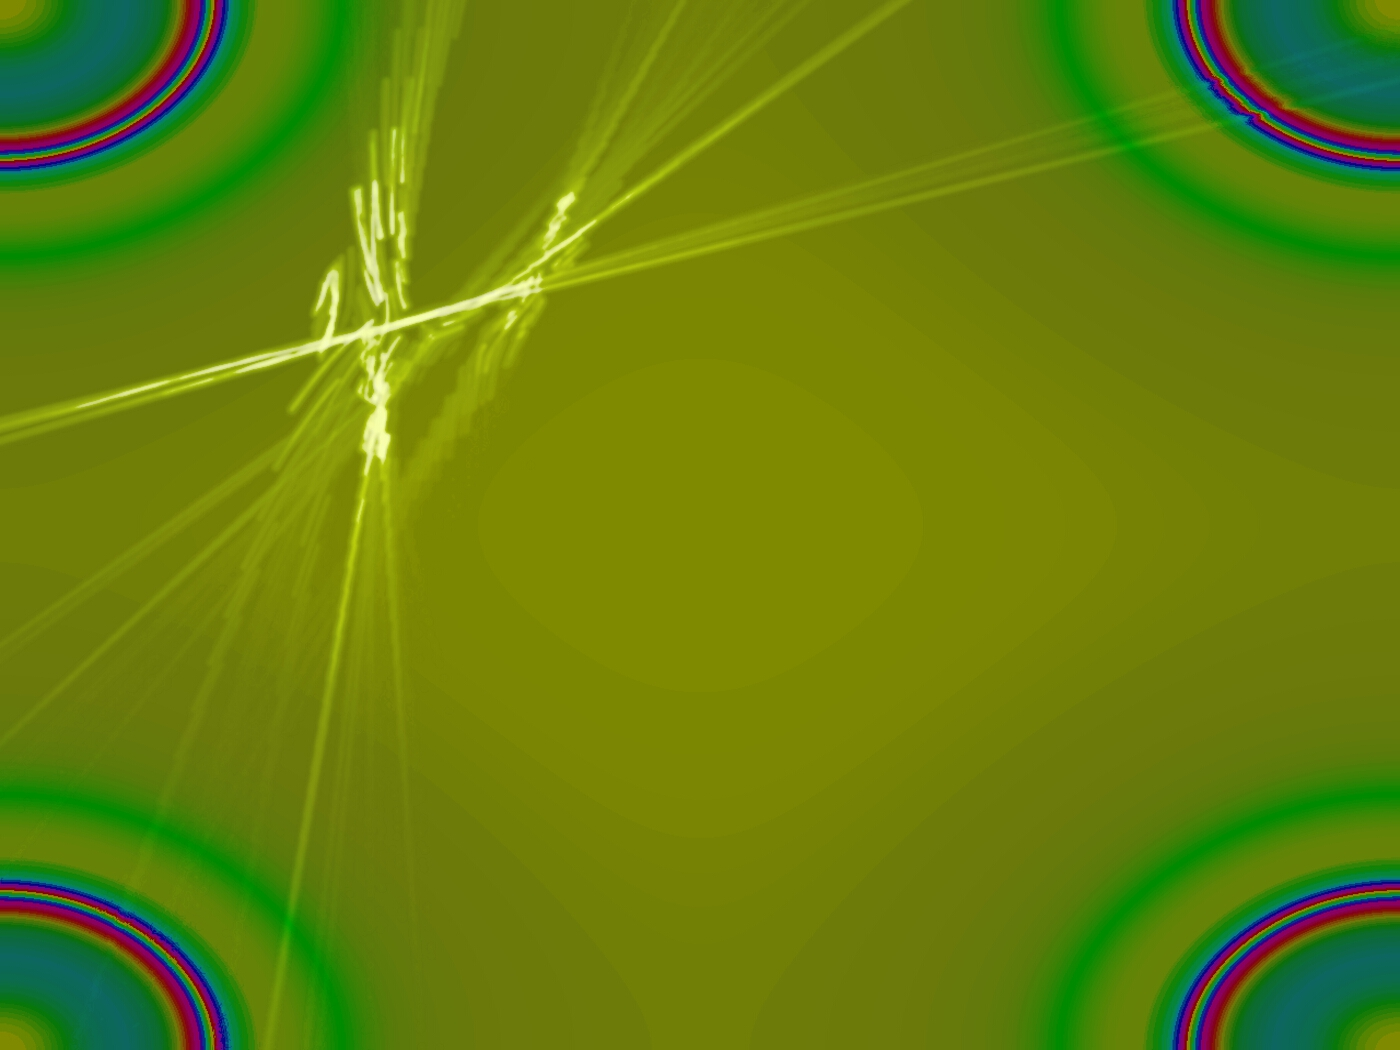 Sfondo Verde 03 Angoli Colorati Sfondi Wallpapers Gratis